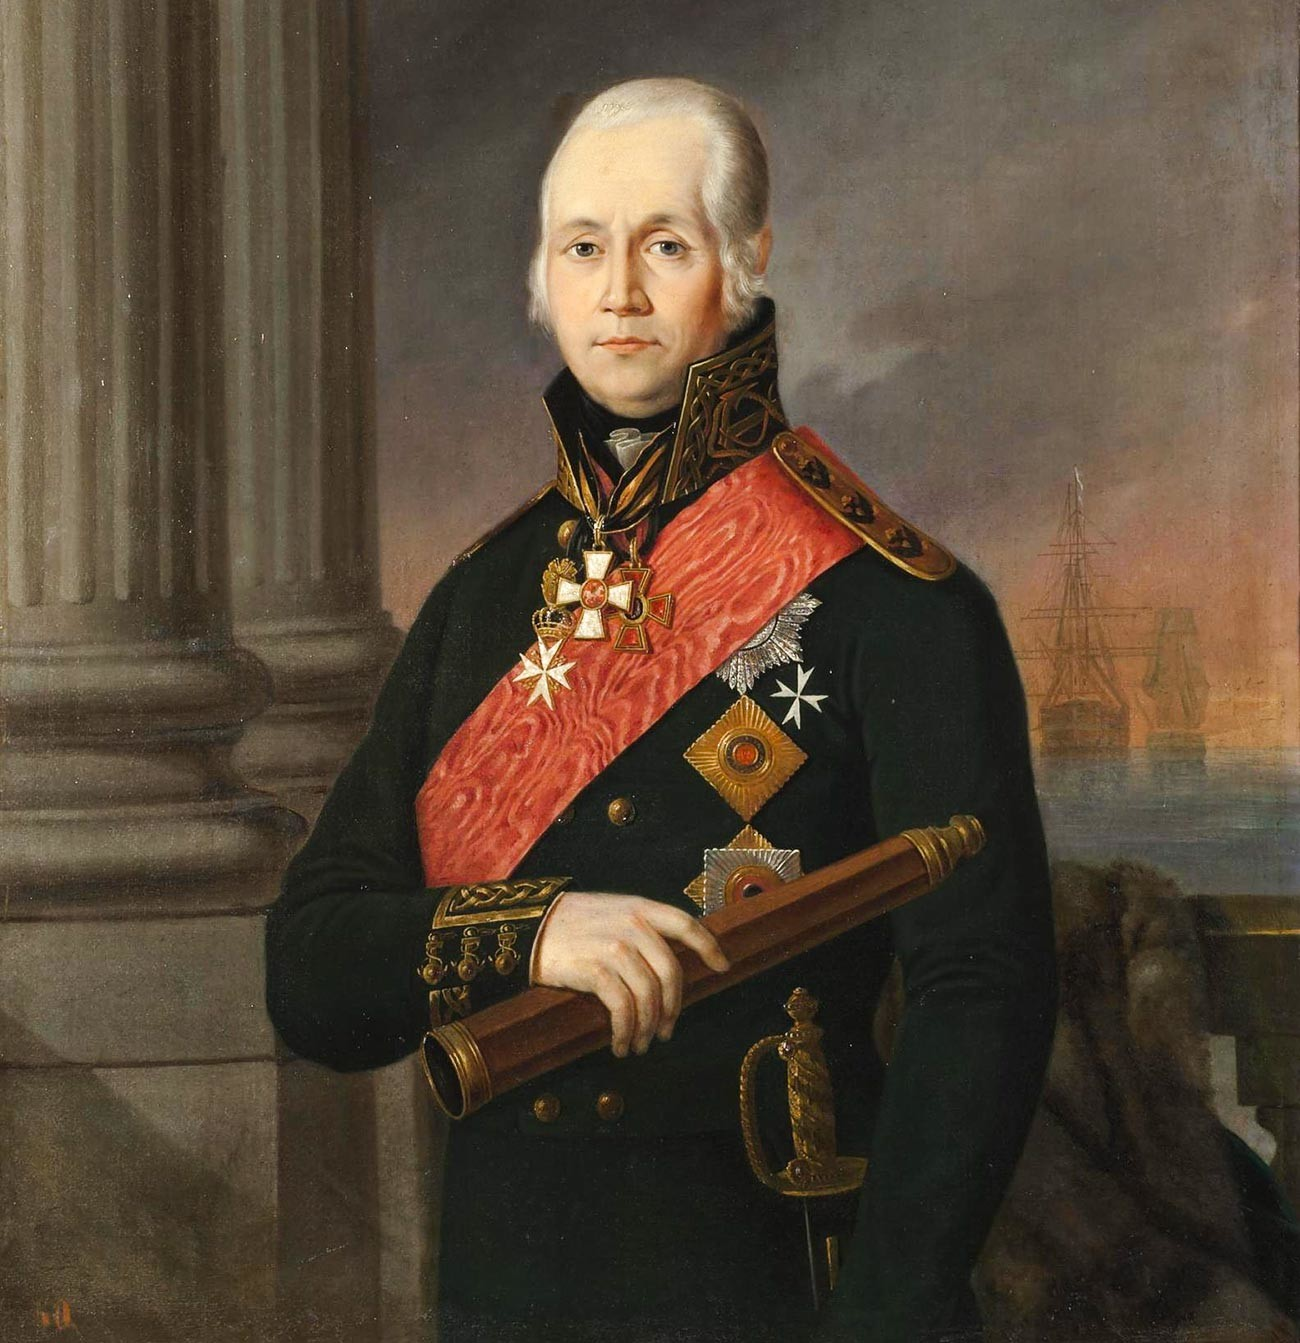 Портрет на адмирал Ф.Ф. Ушаков